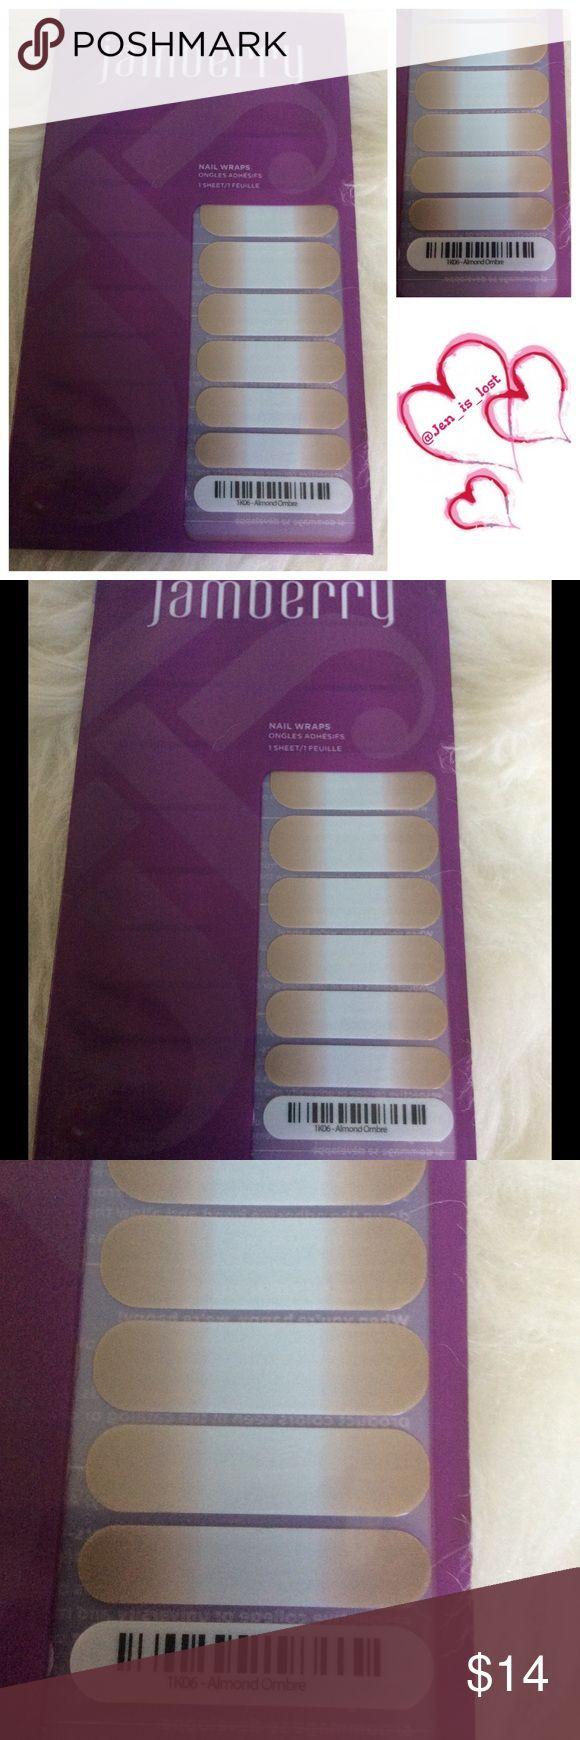 Jamberry Almond Ombré 1 Sheet Jamberry Nail Wraps Almond Ombré 1 Sheet Jamberry Accessories